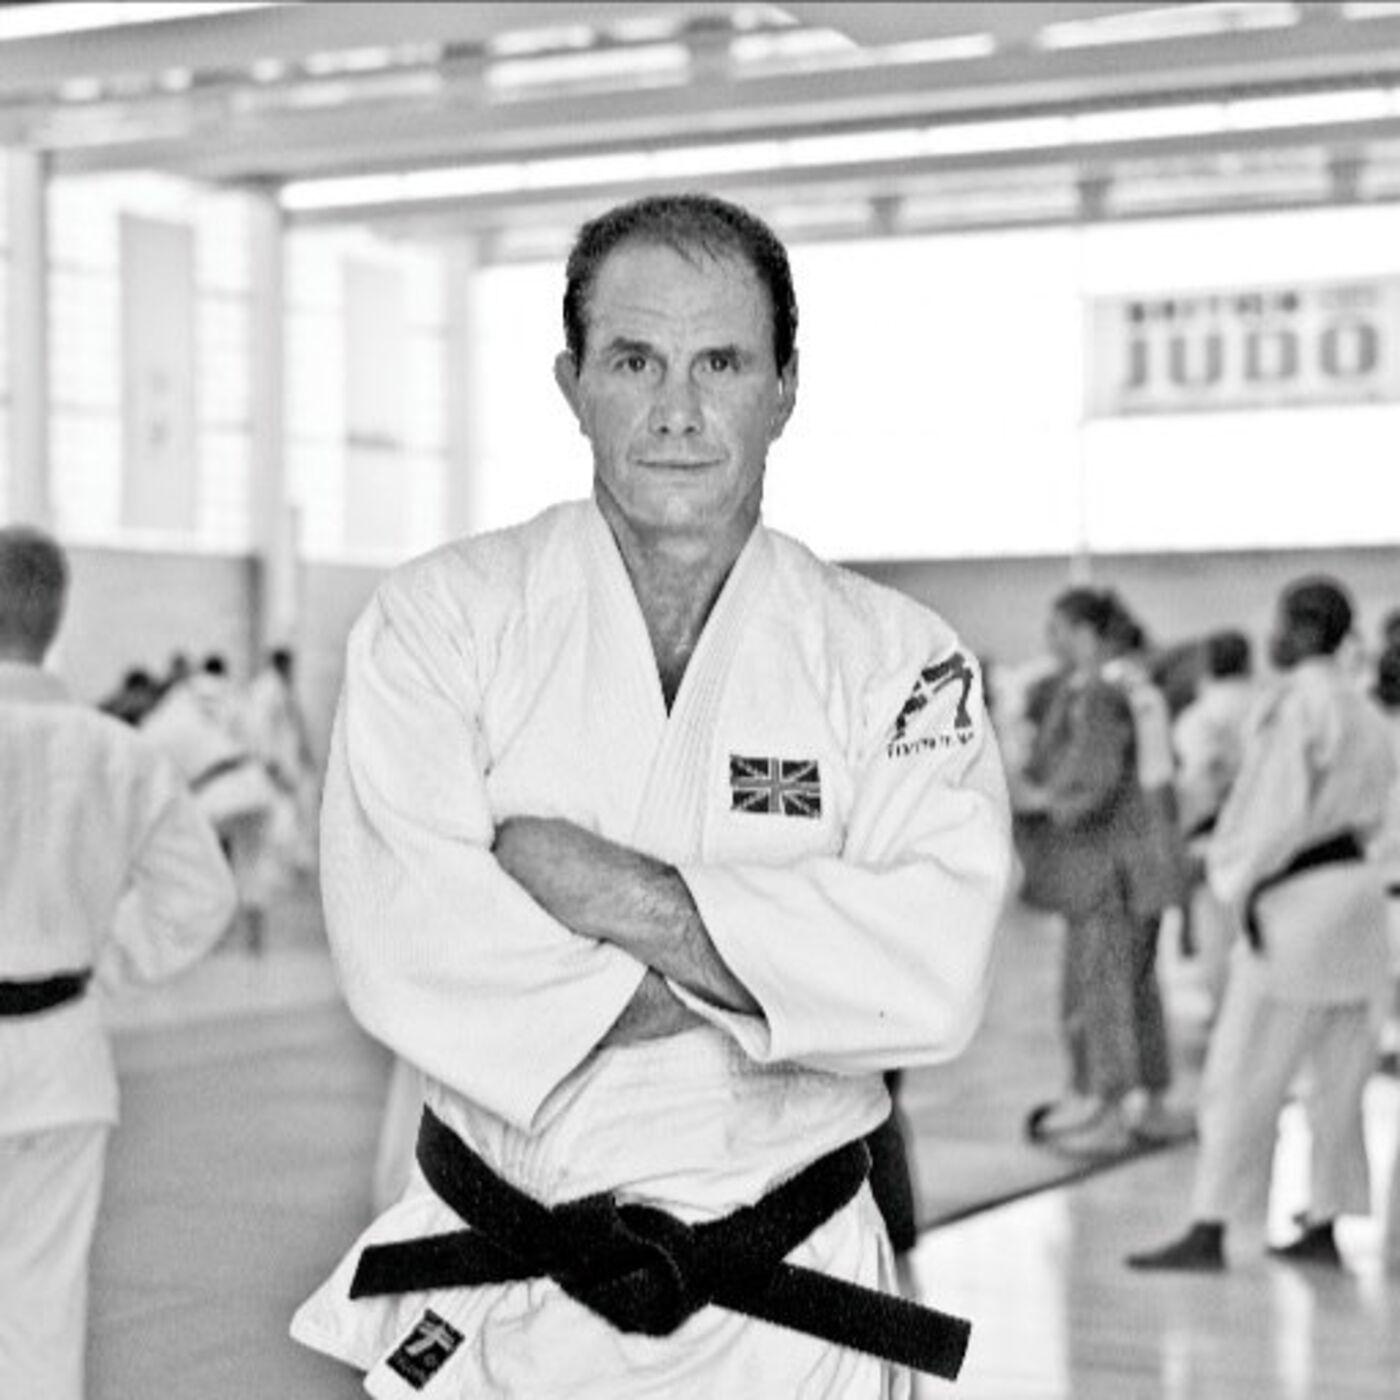 Neil Adams - (Part 1) World Judo Champion